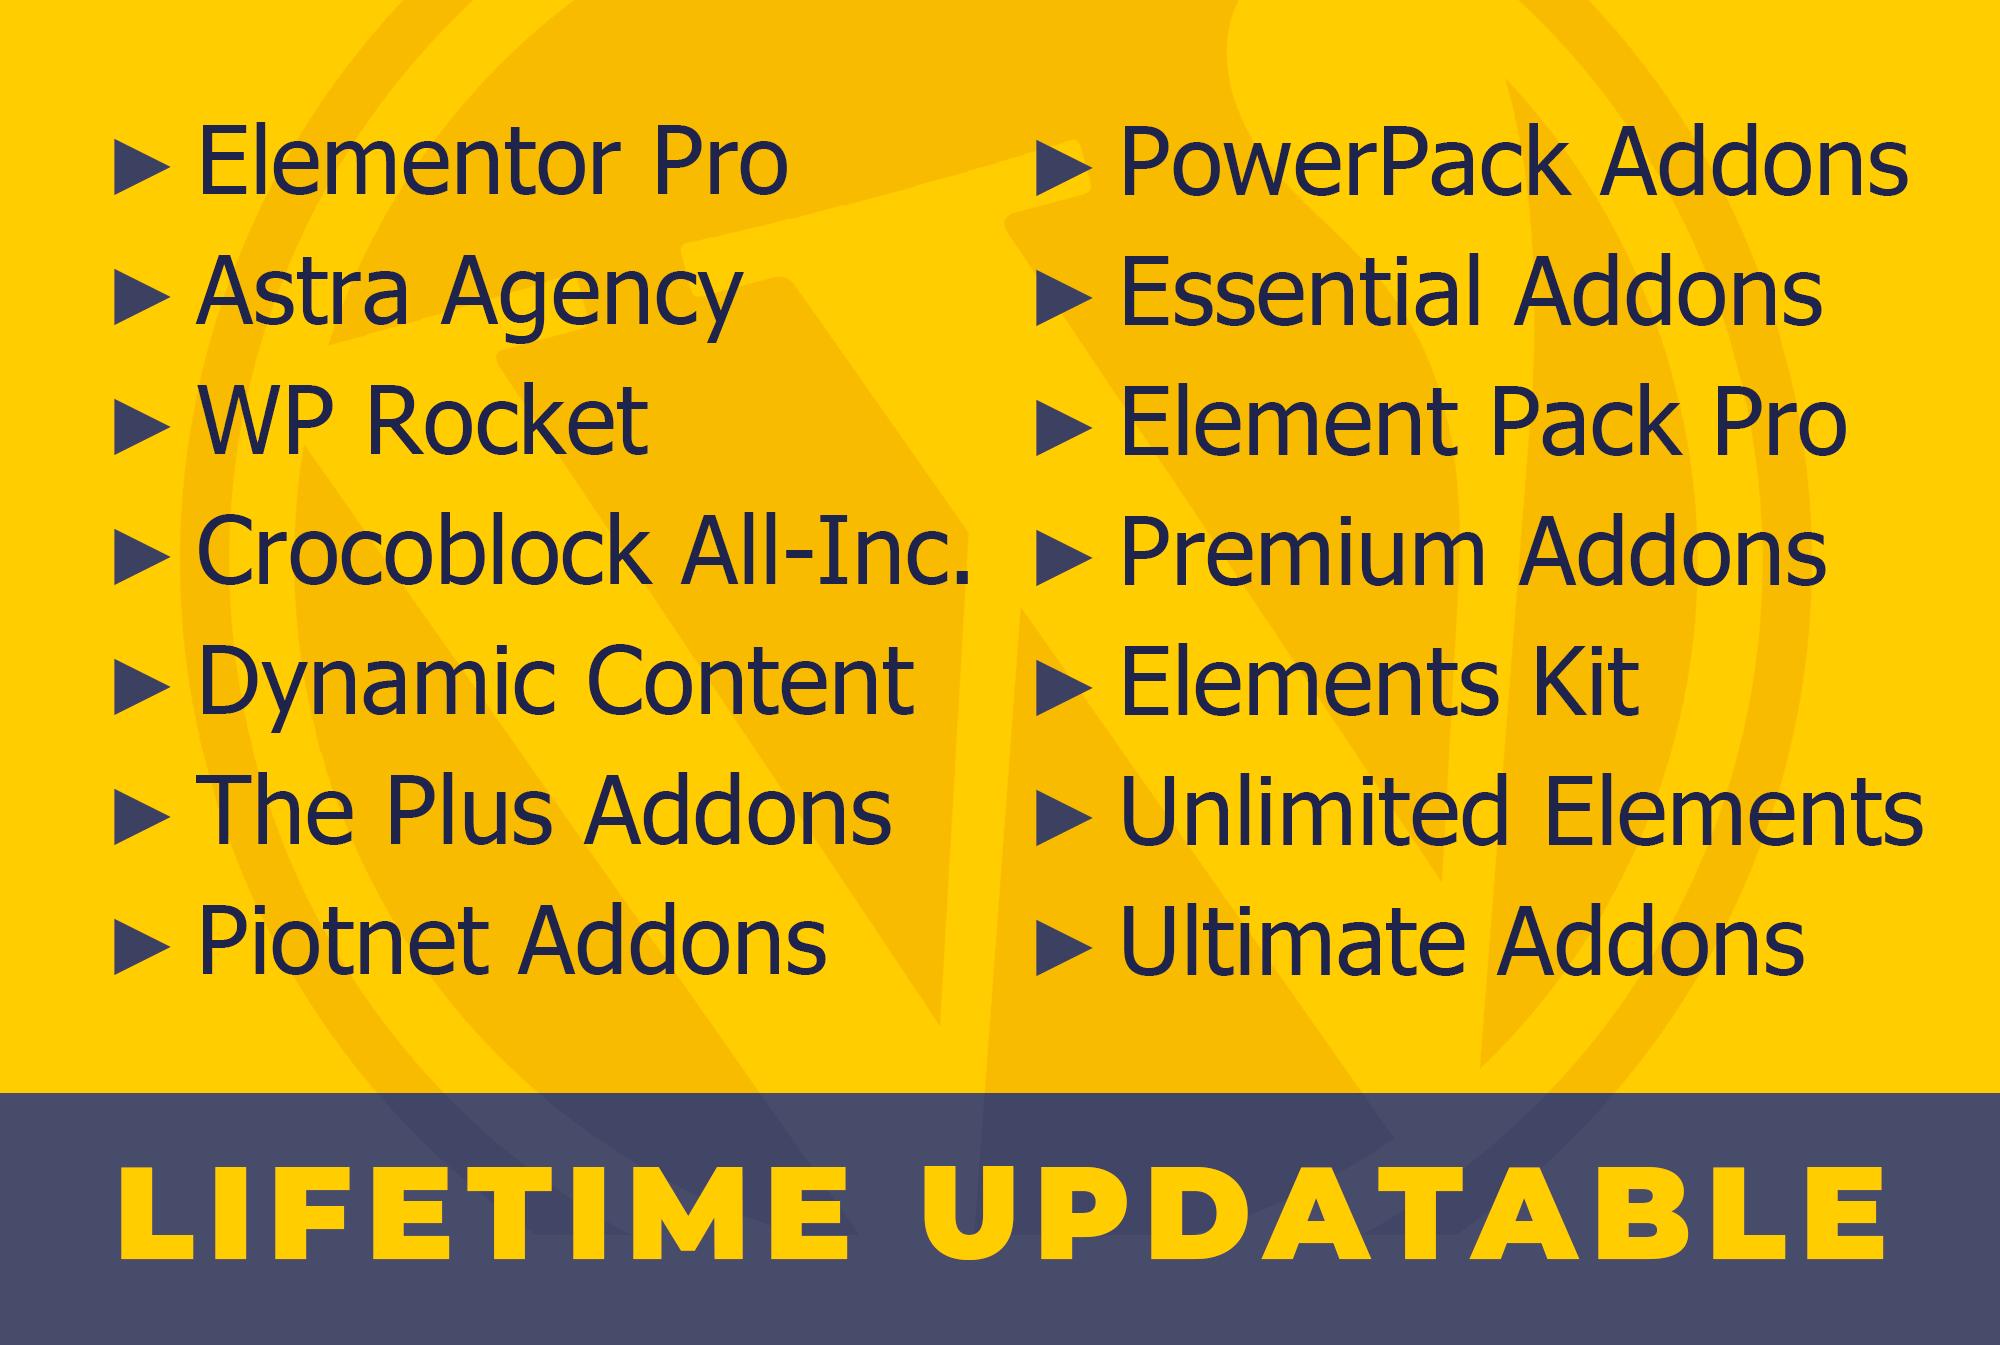 Install Elementor Pro,  Astra Pro Agency,  Crocoblock Jet Bundle,  WP Rocket on WordPress website